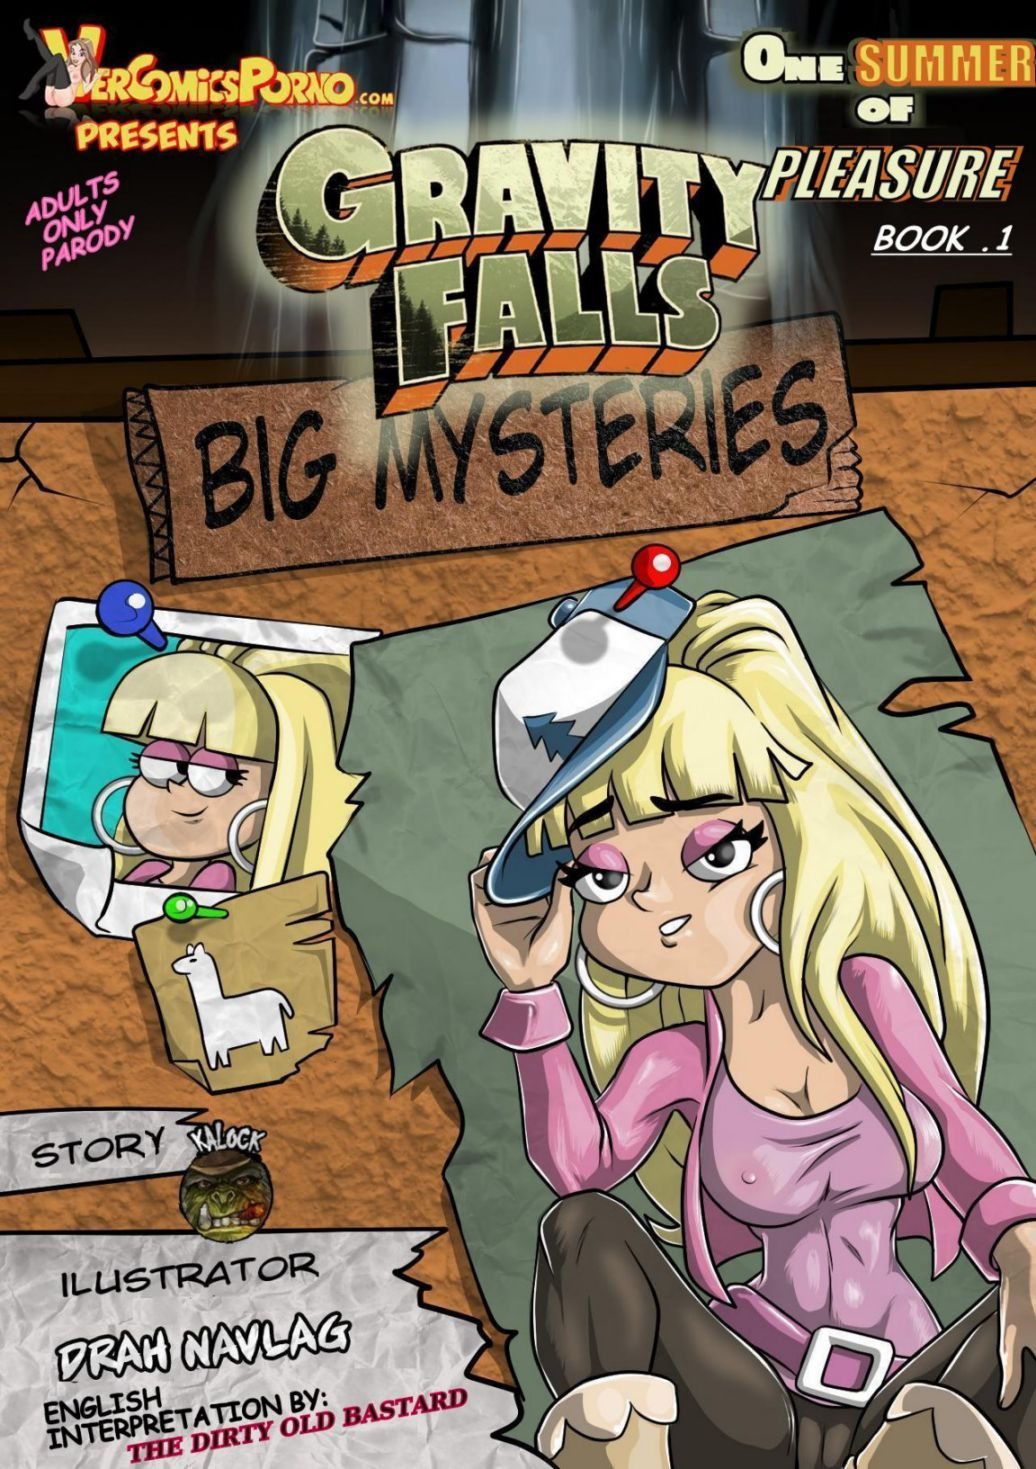 Mystery Teen Sex Porn Videos 19